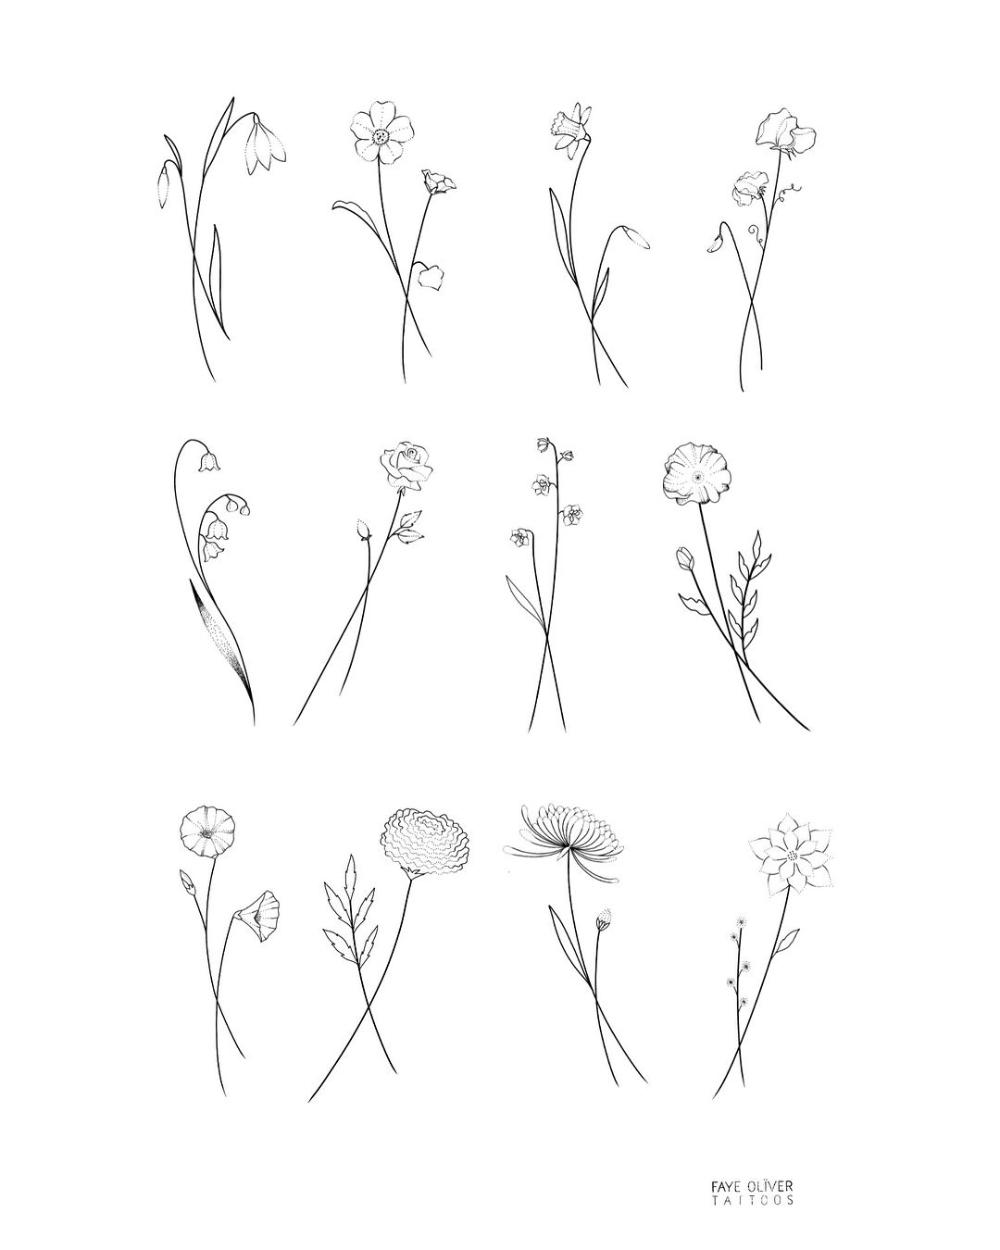 Small November Birth Flower Tattoo Google Search In 2020 Birth Flowers Violet Flower Tattoos Violet Tattoo